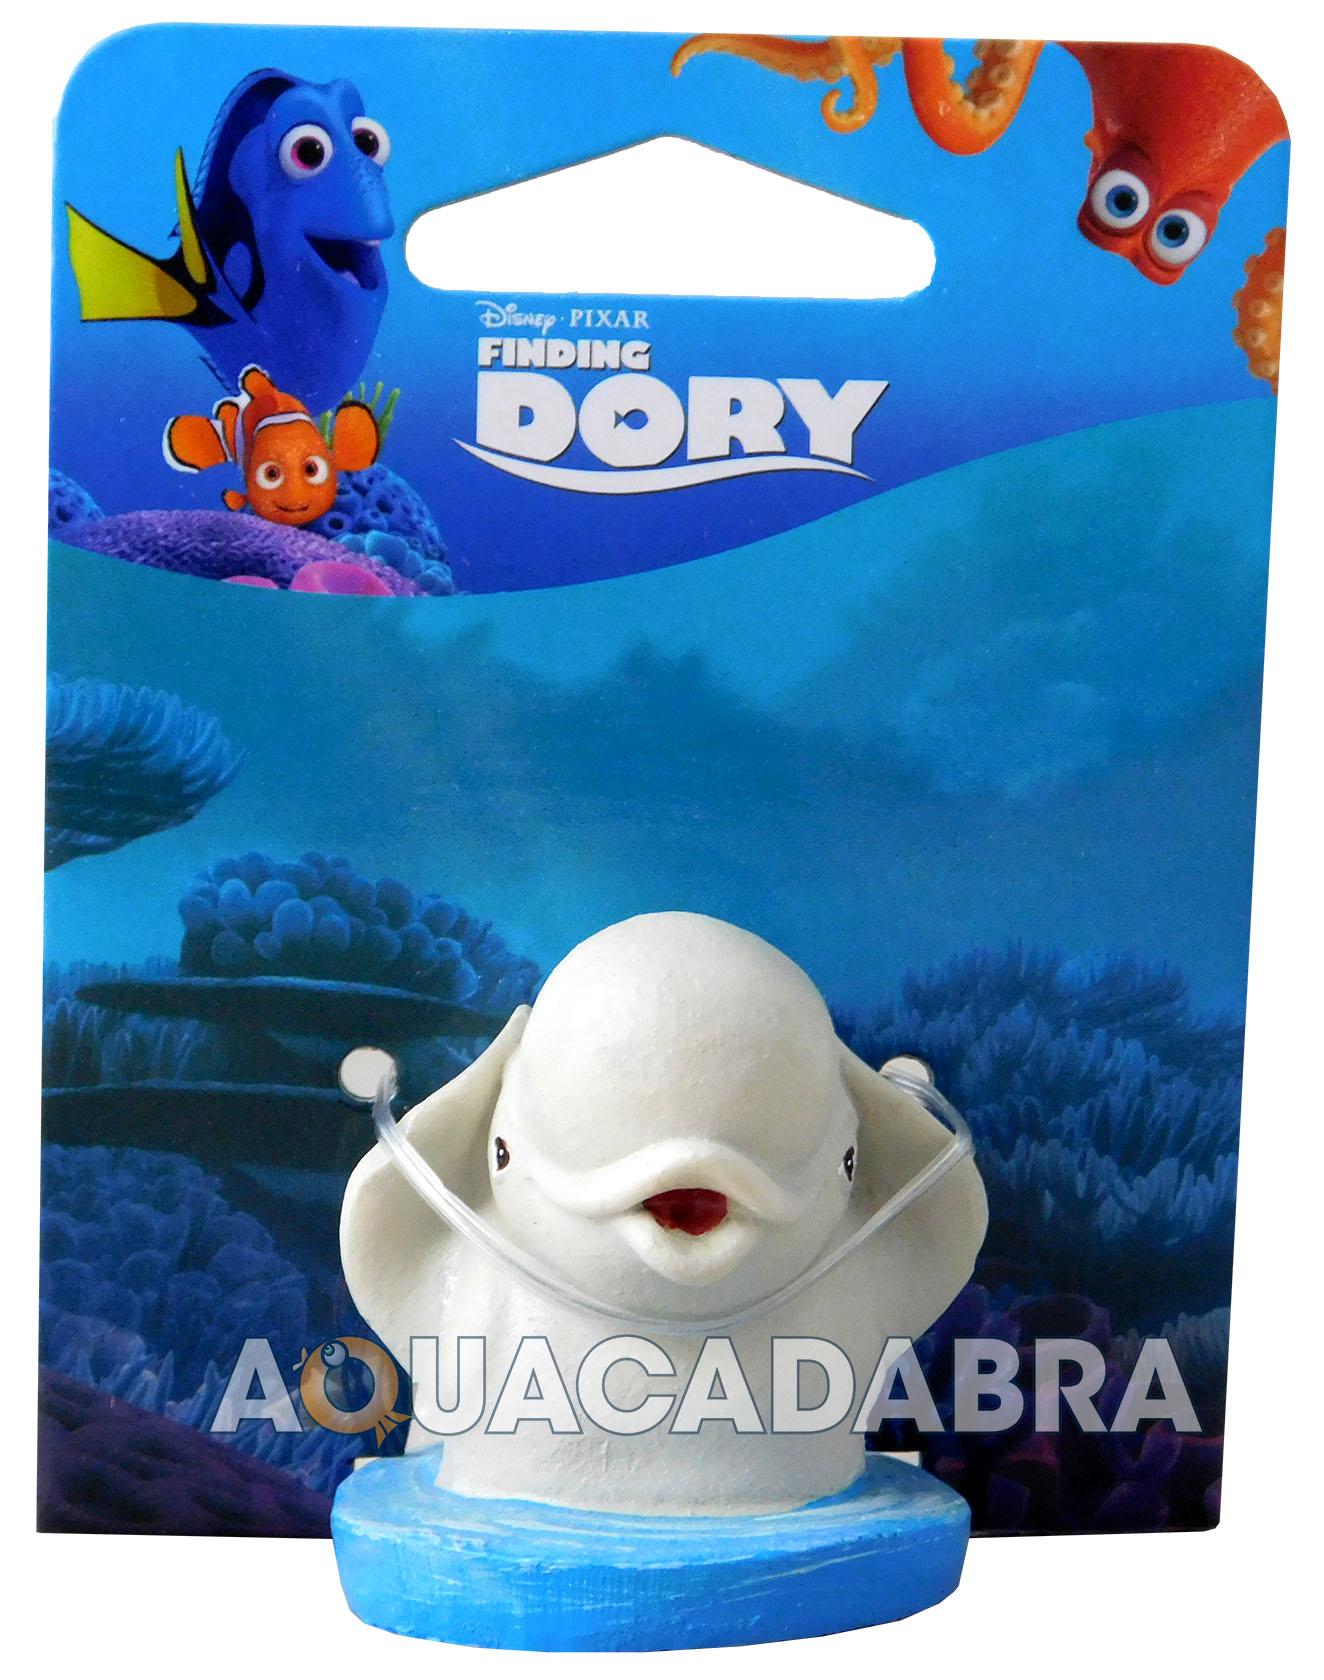 Finding dory bailey aquarium ornaments disney pixar fish for Disney fish tank